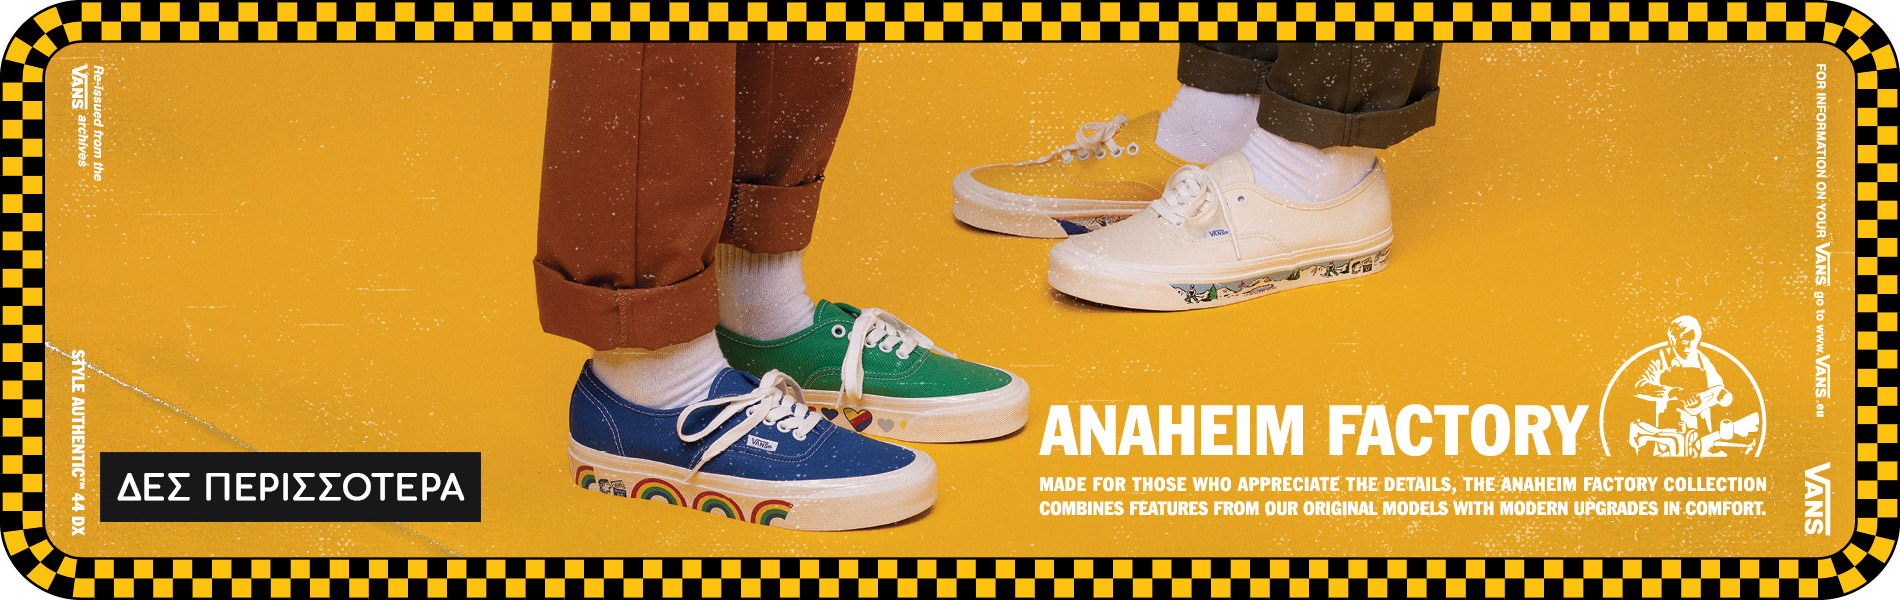 Vans Anaheim Factory